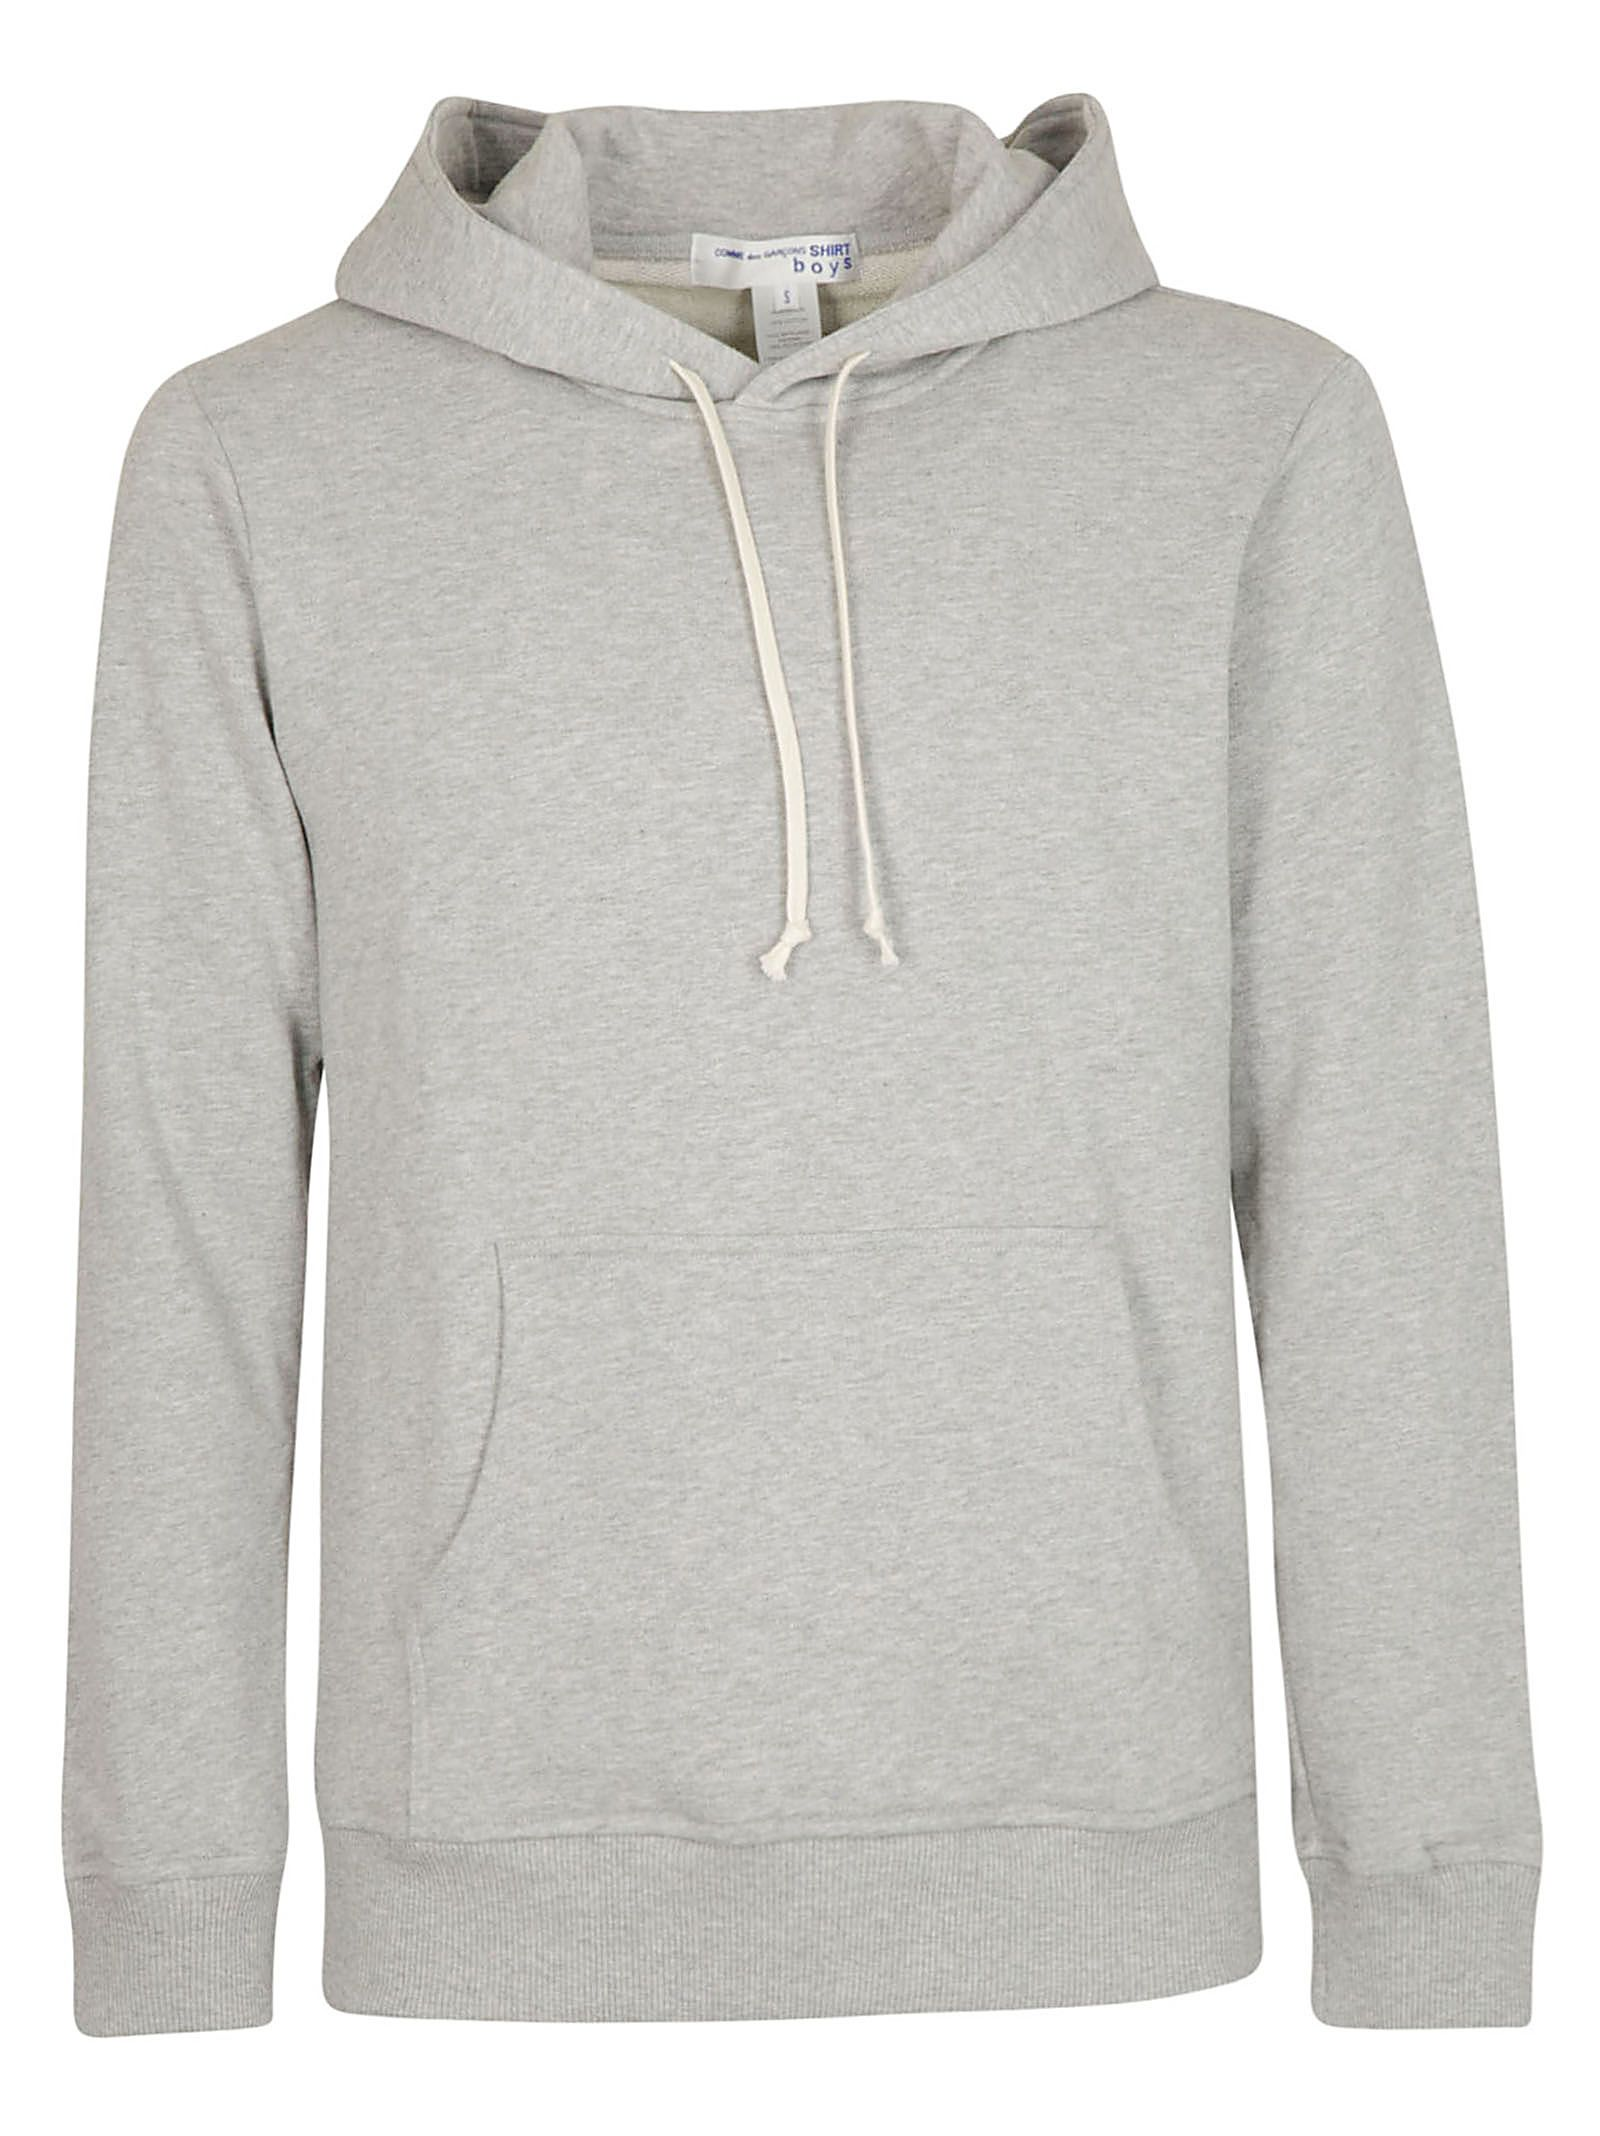 COMME DES GARÇONS BOYS Comme Des Garçons Boys Hooded Sweatshirt in Grigio